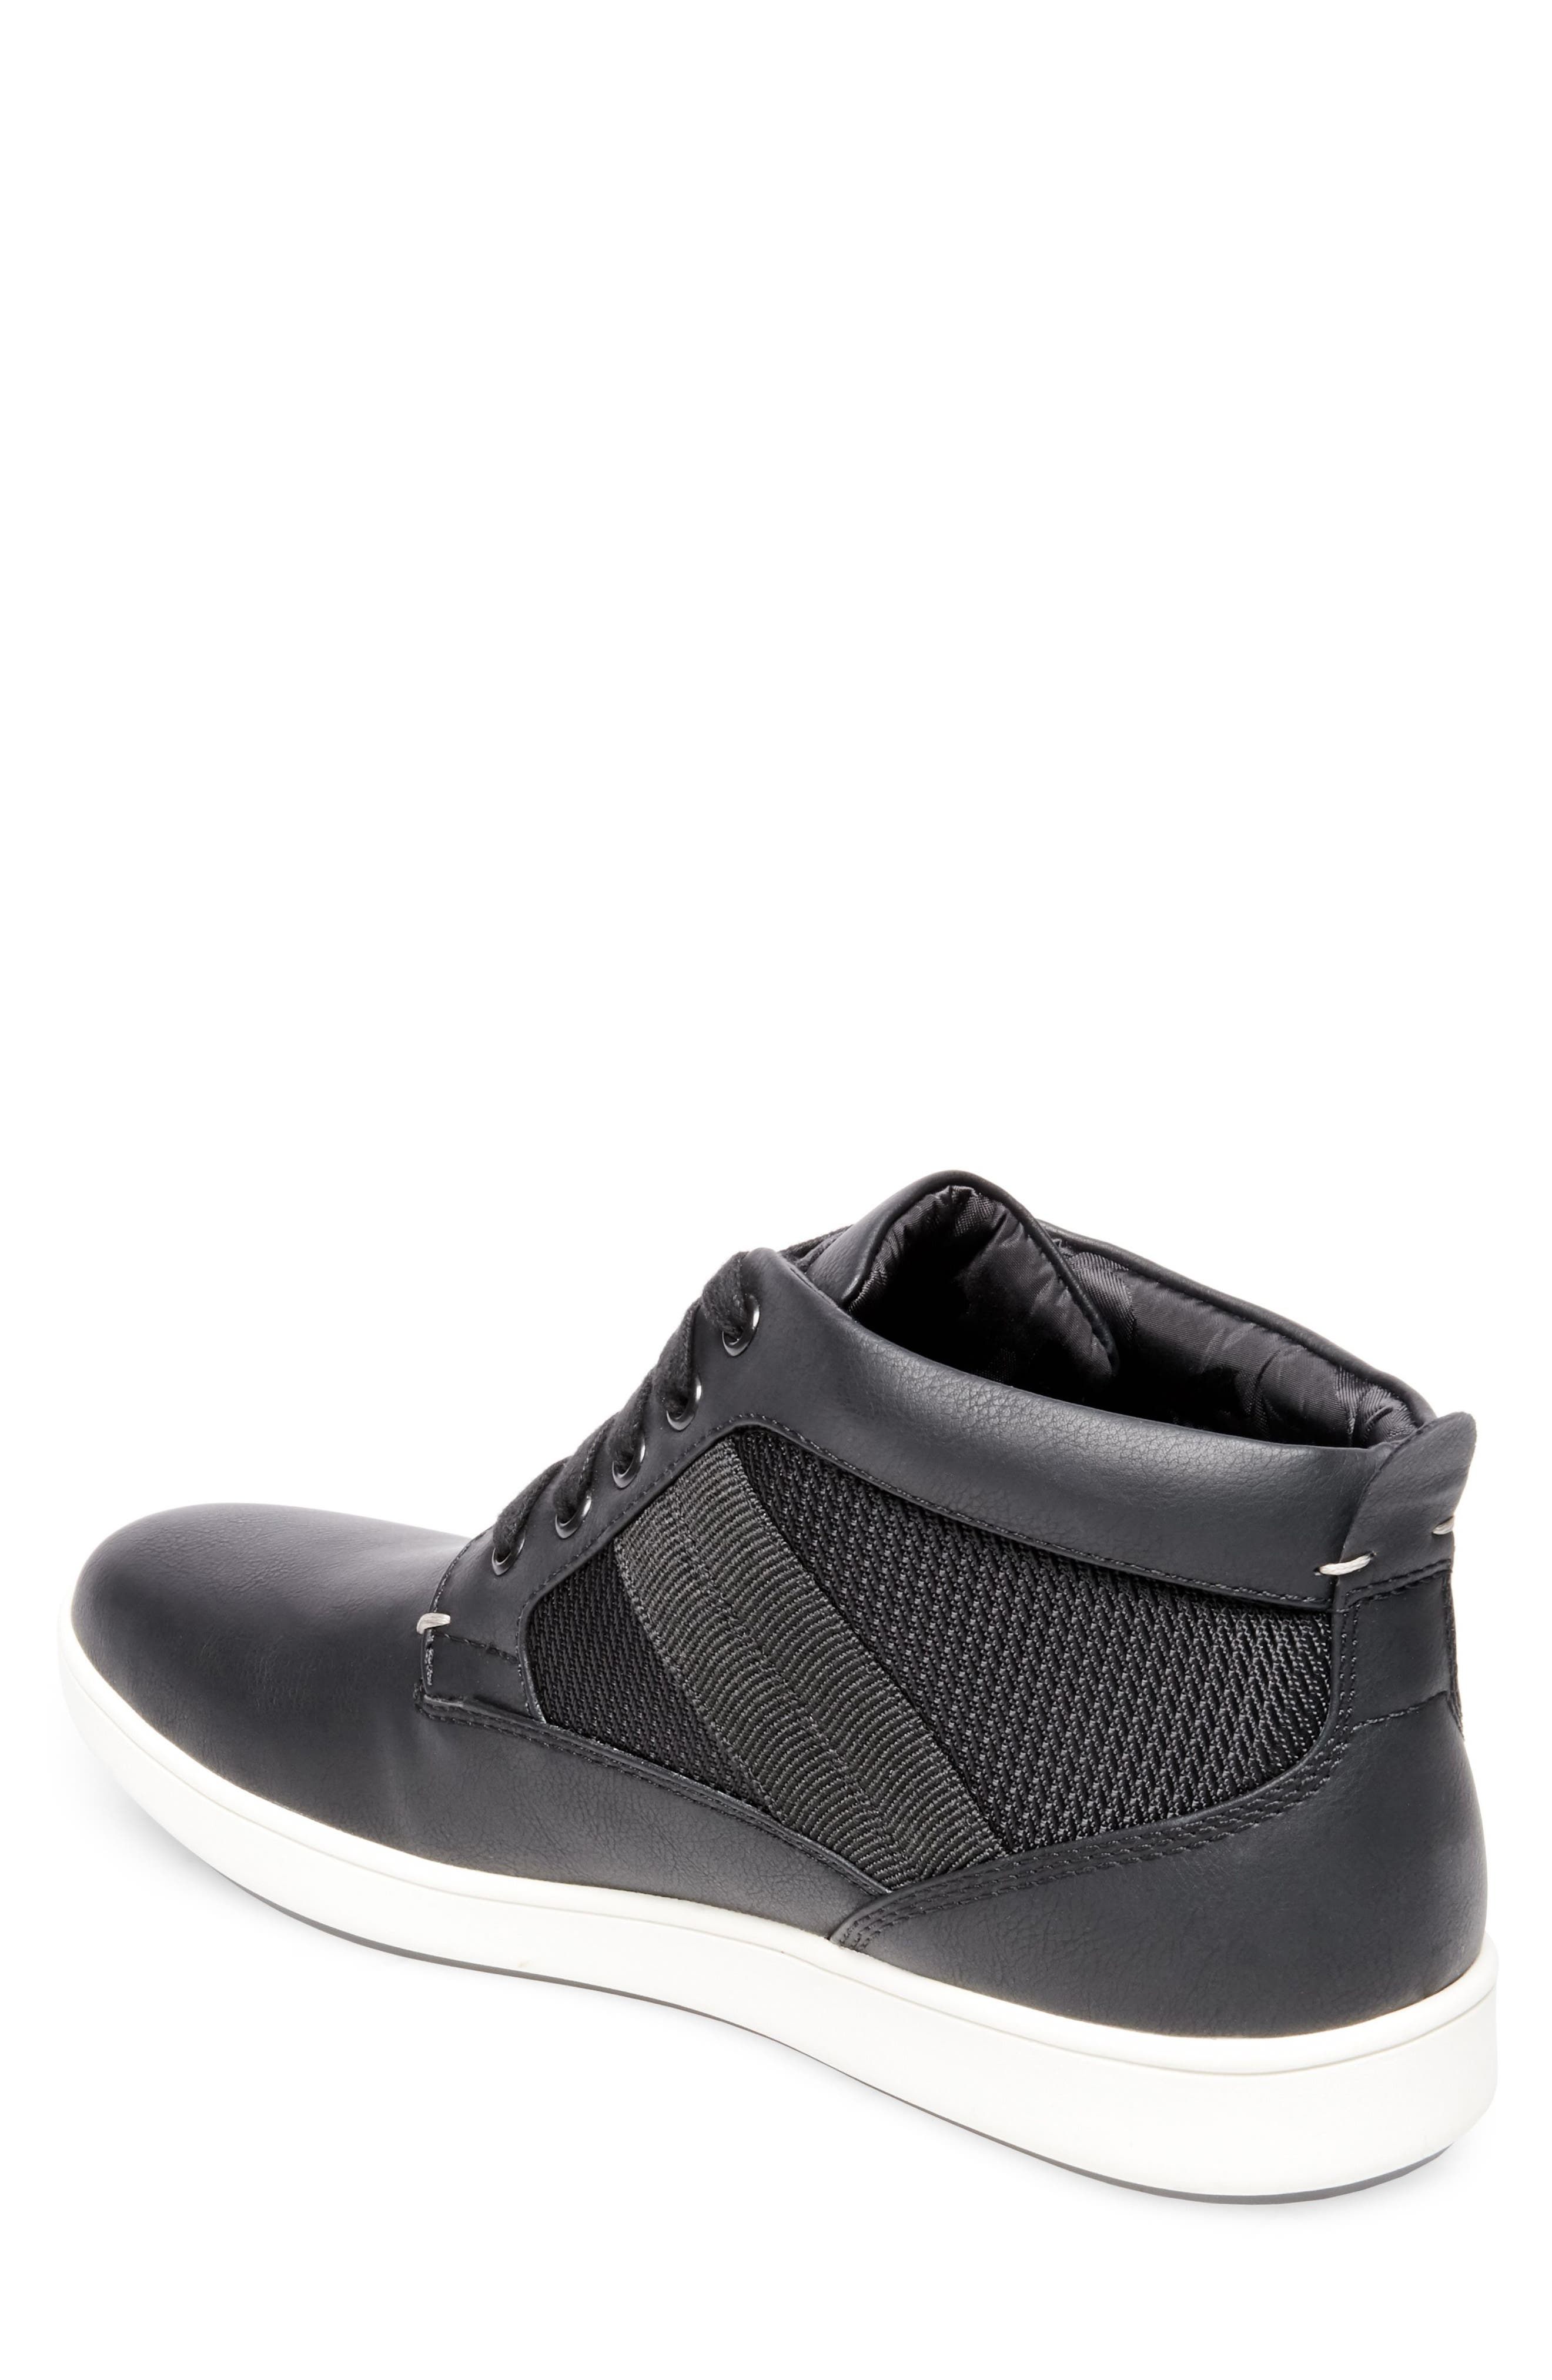 Frazier Sneaker Boot,                             Alternate thumbnail 2, color,                             007